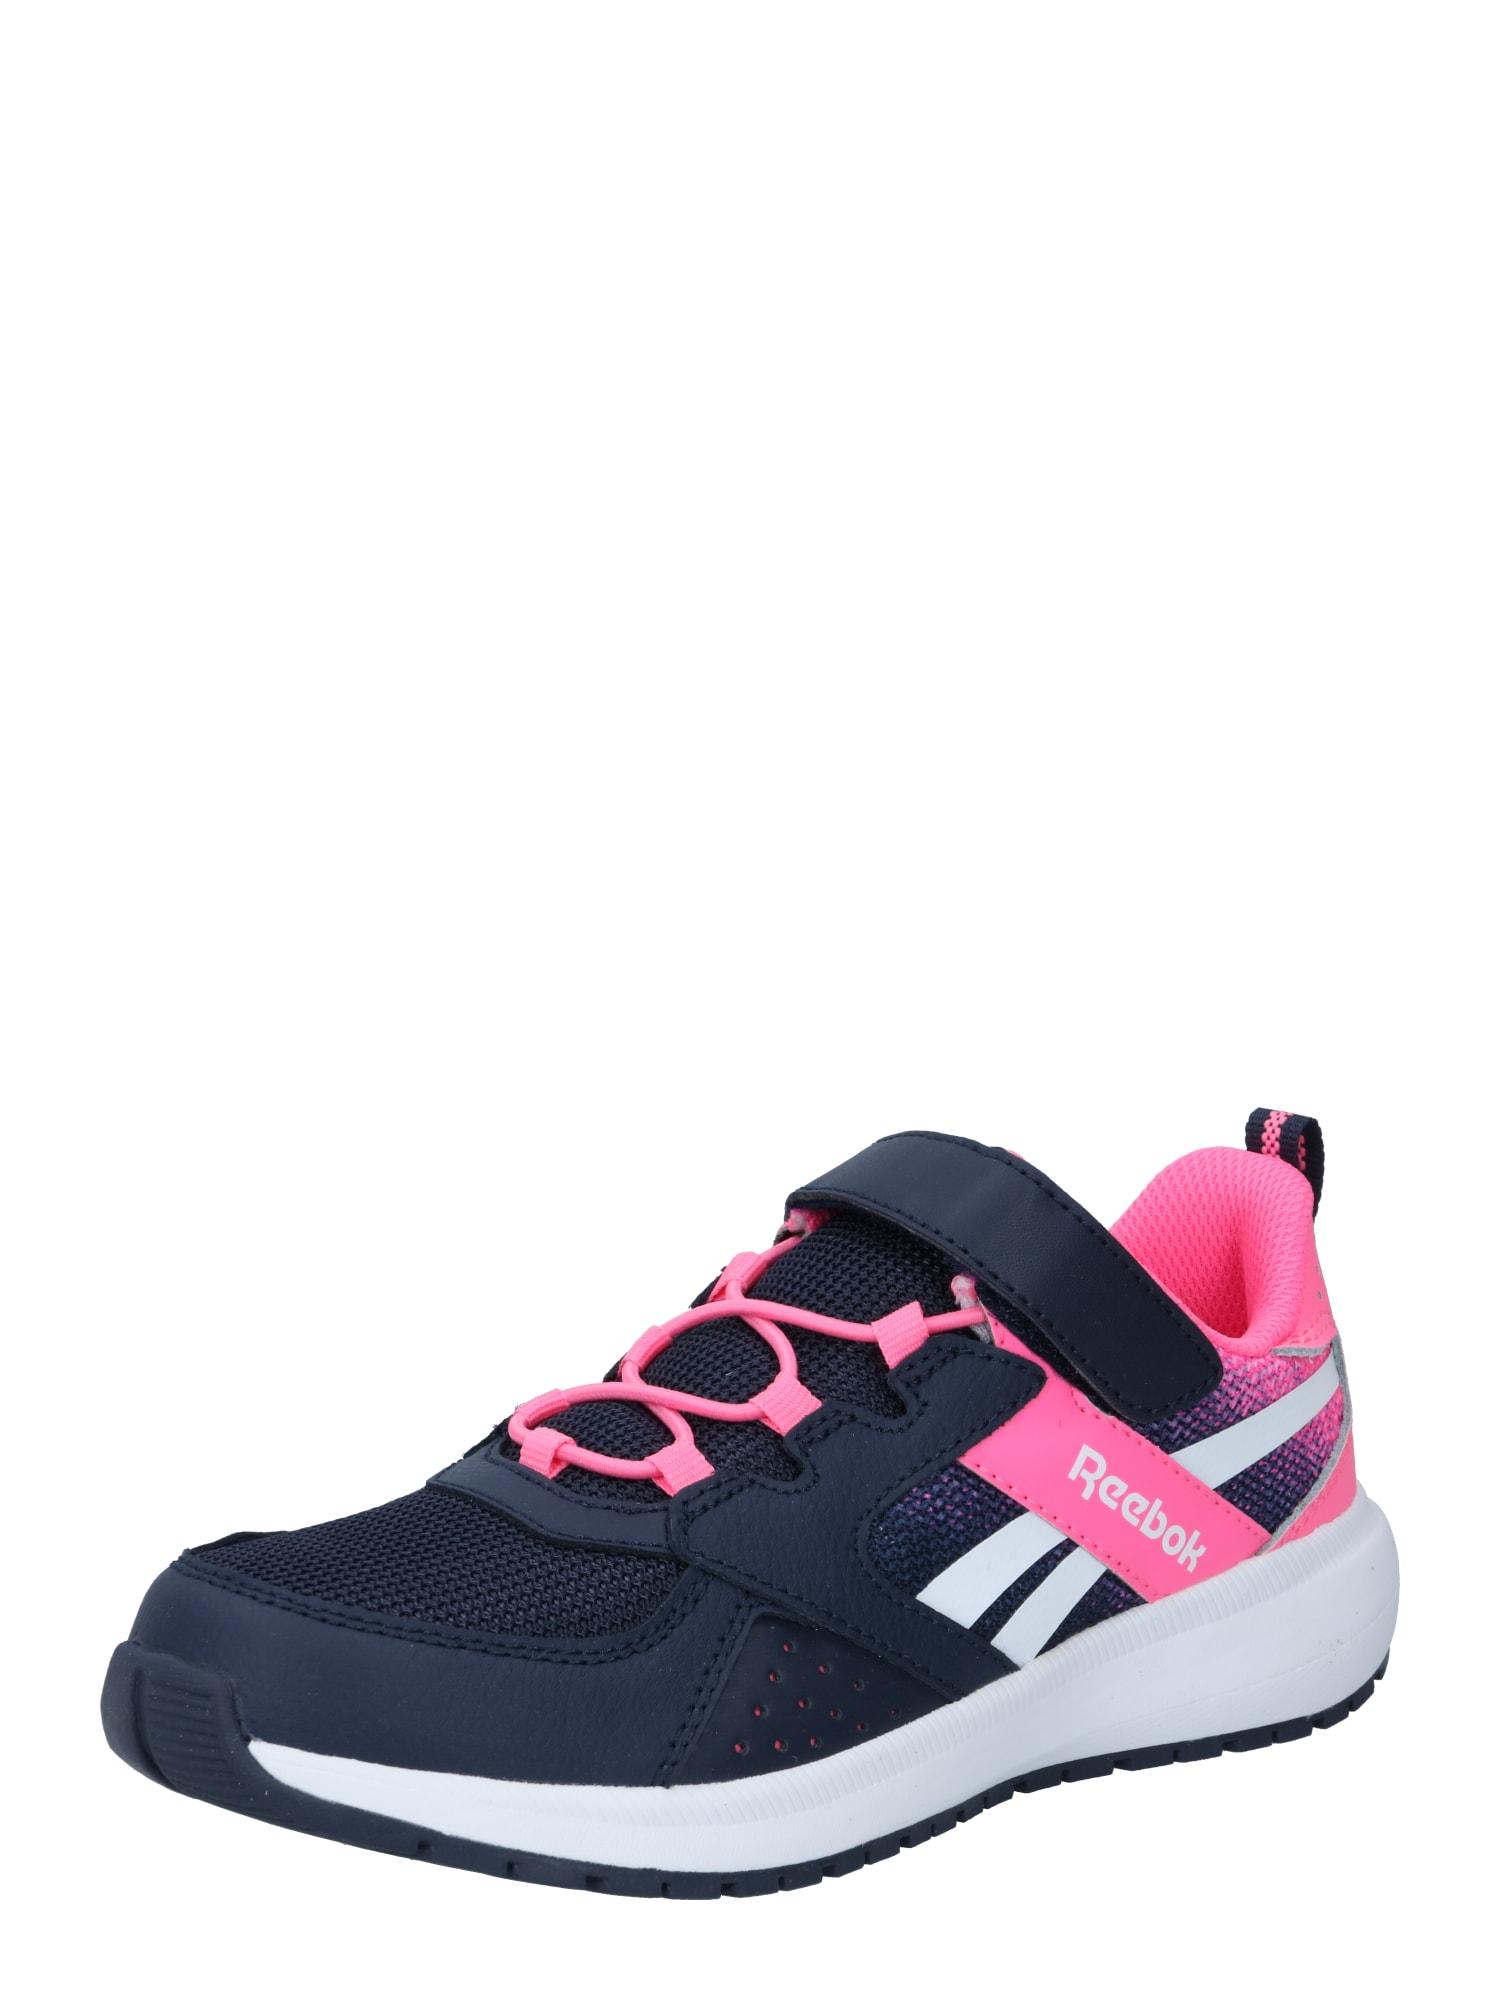 REEBOK Sportiniai batai 'REEBOK ROAD SUPREME 2.0 ALT' tamsiai mėlyna